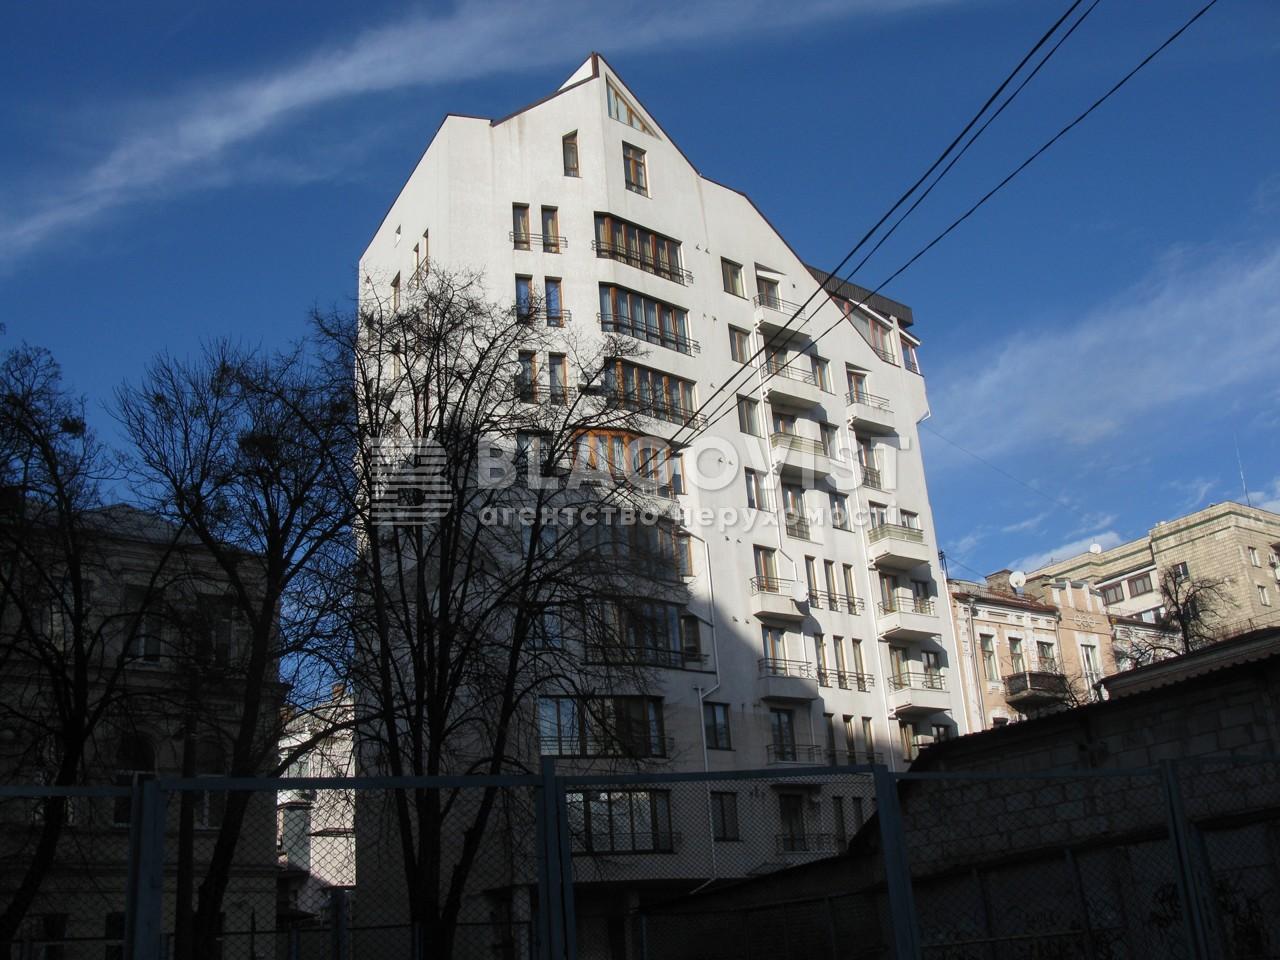 Квартира R-13070, Бутышев пер. (Иванова Андрея), 13, Киев - Фото 1